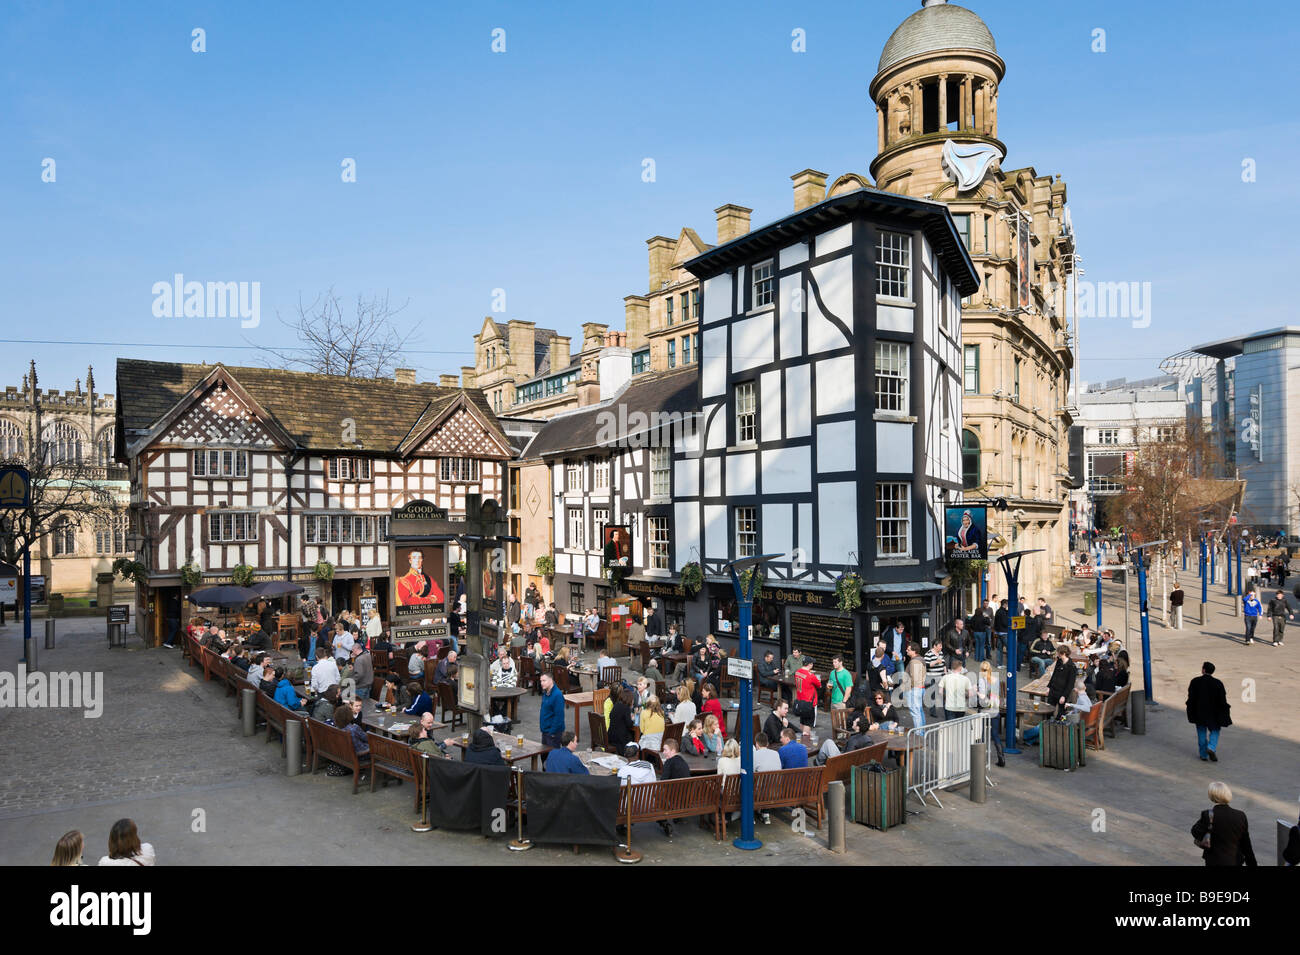 L'ancienne auberge de Wellington et Sinclair's Oyster Bar, Cathedral Gates, Exchange Square, Manchester, Photo Stock